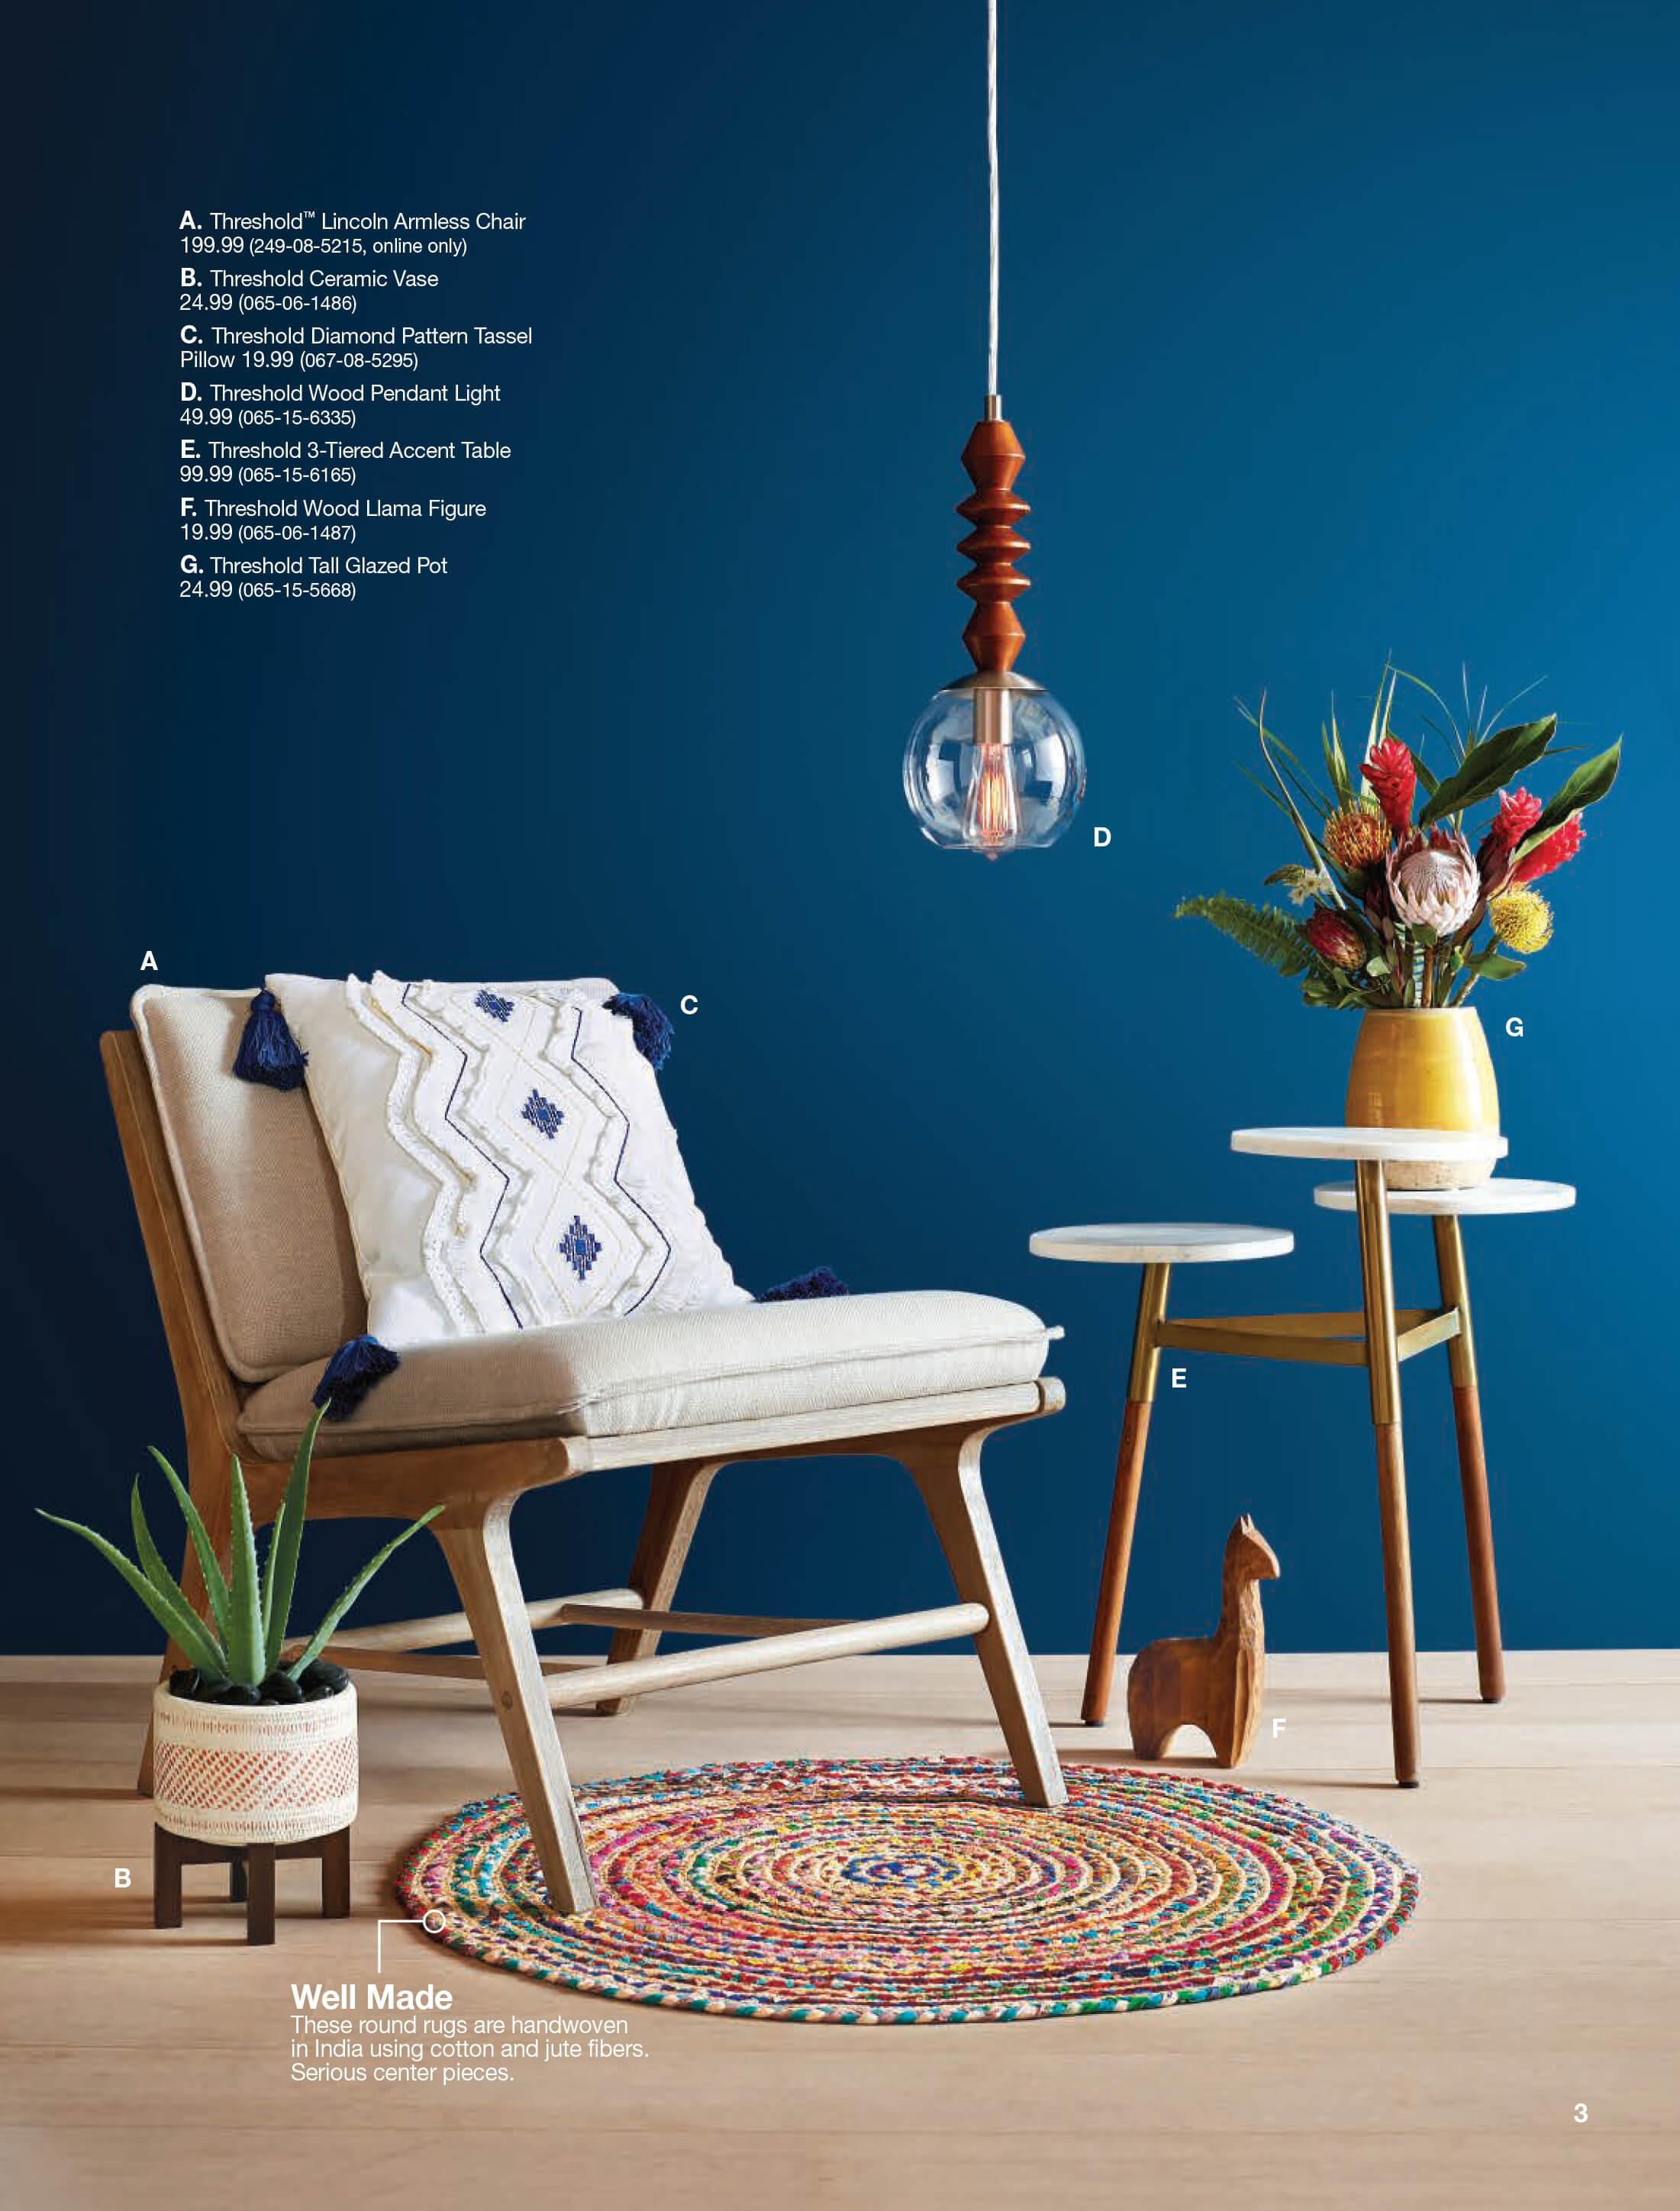 target gold vase of target barrel chair threshold sante blog throughout emily henderson target first look spring catalog 12